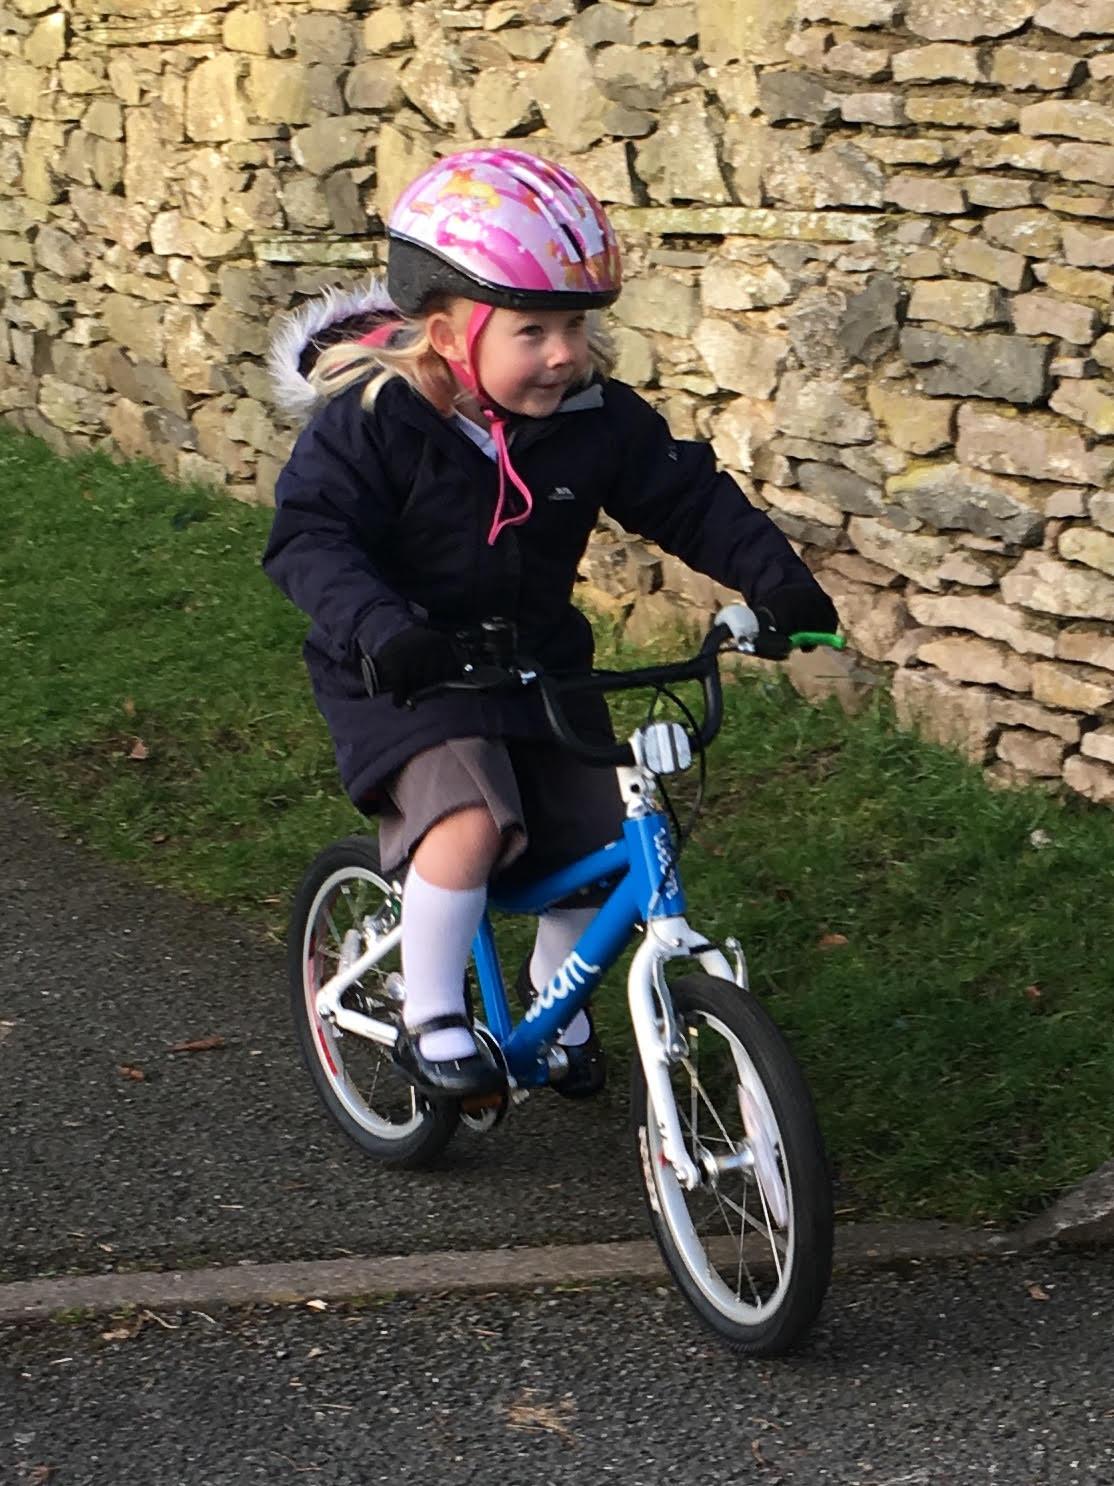 "Woom 3 16"" wheel bike review - the bike in action"